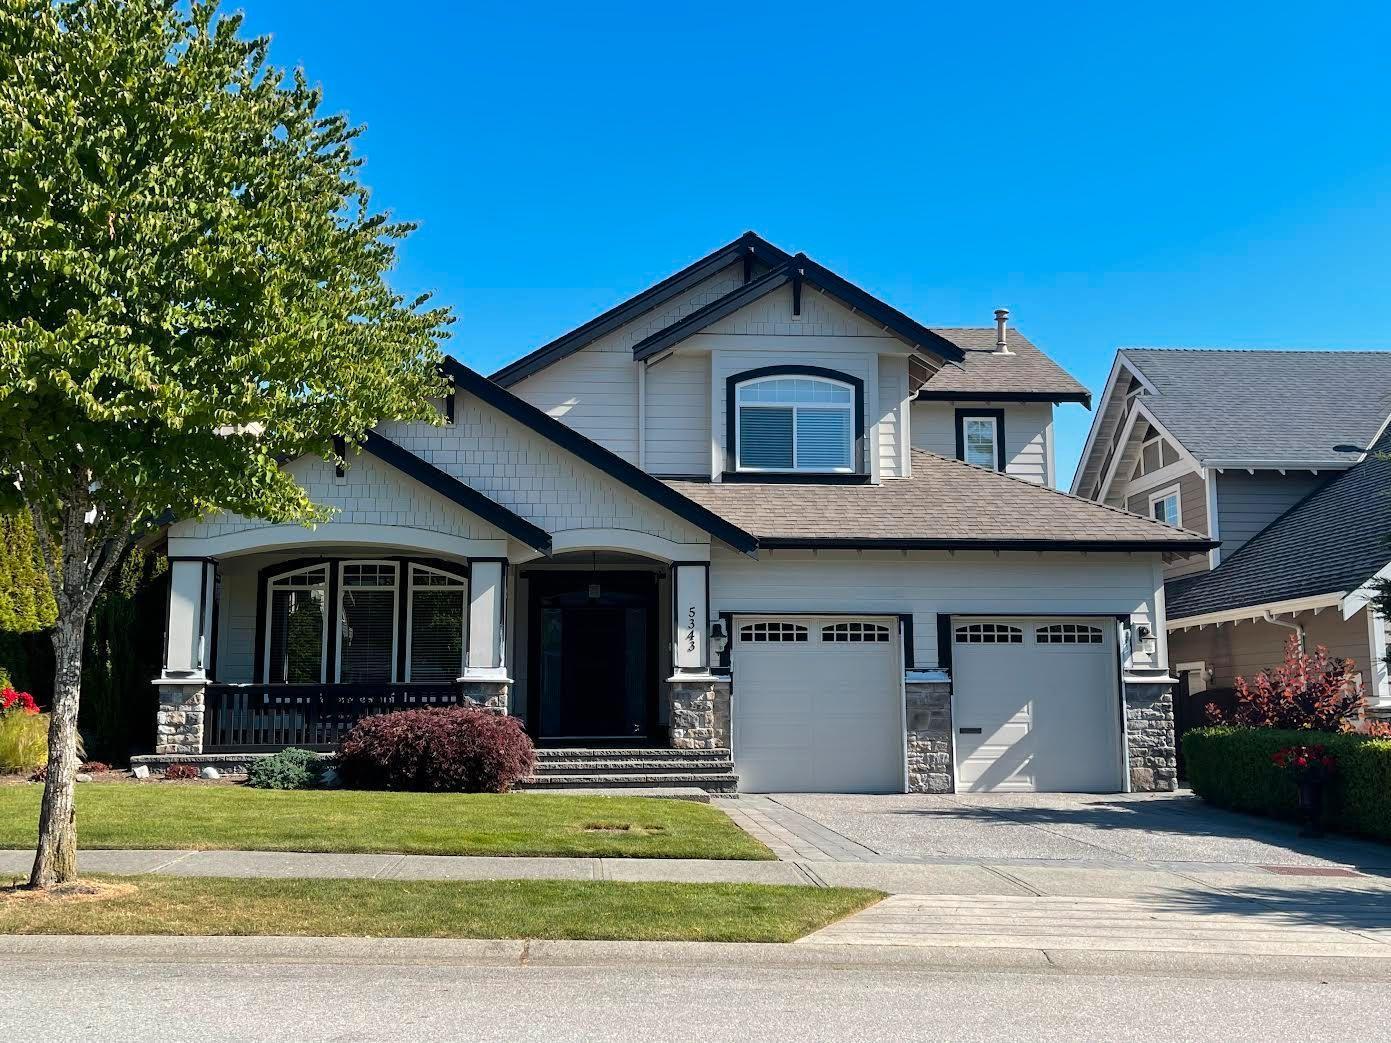 Main Photo: 5343 SPETIFORE Crescent in Delta: Tsawwassen Central House for sale (Tsawwassen)  : MLS®# R2597271